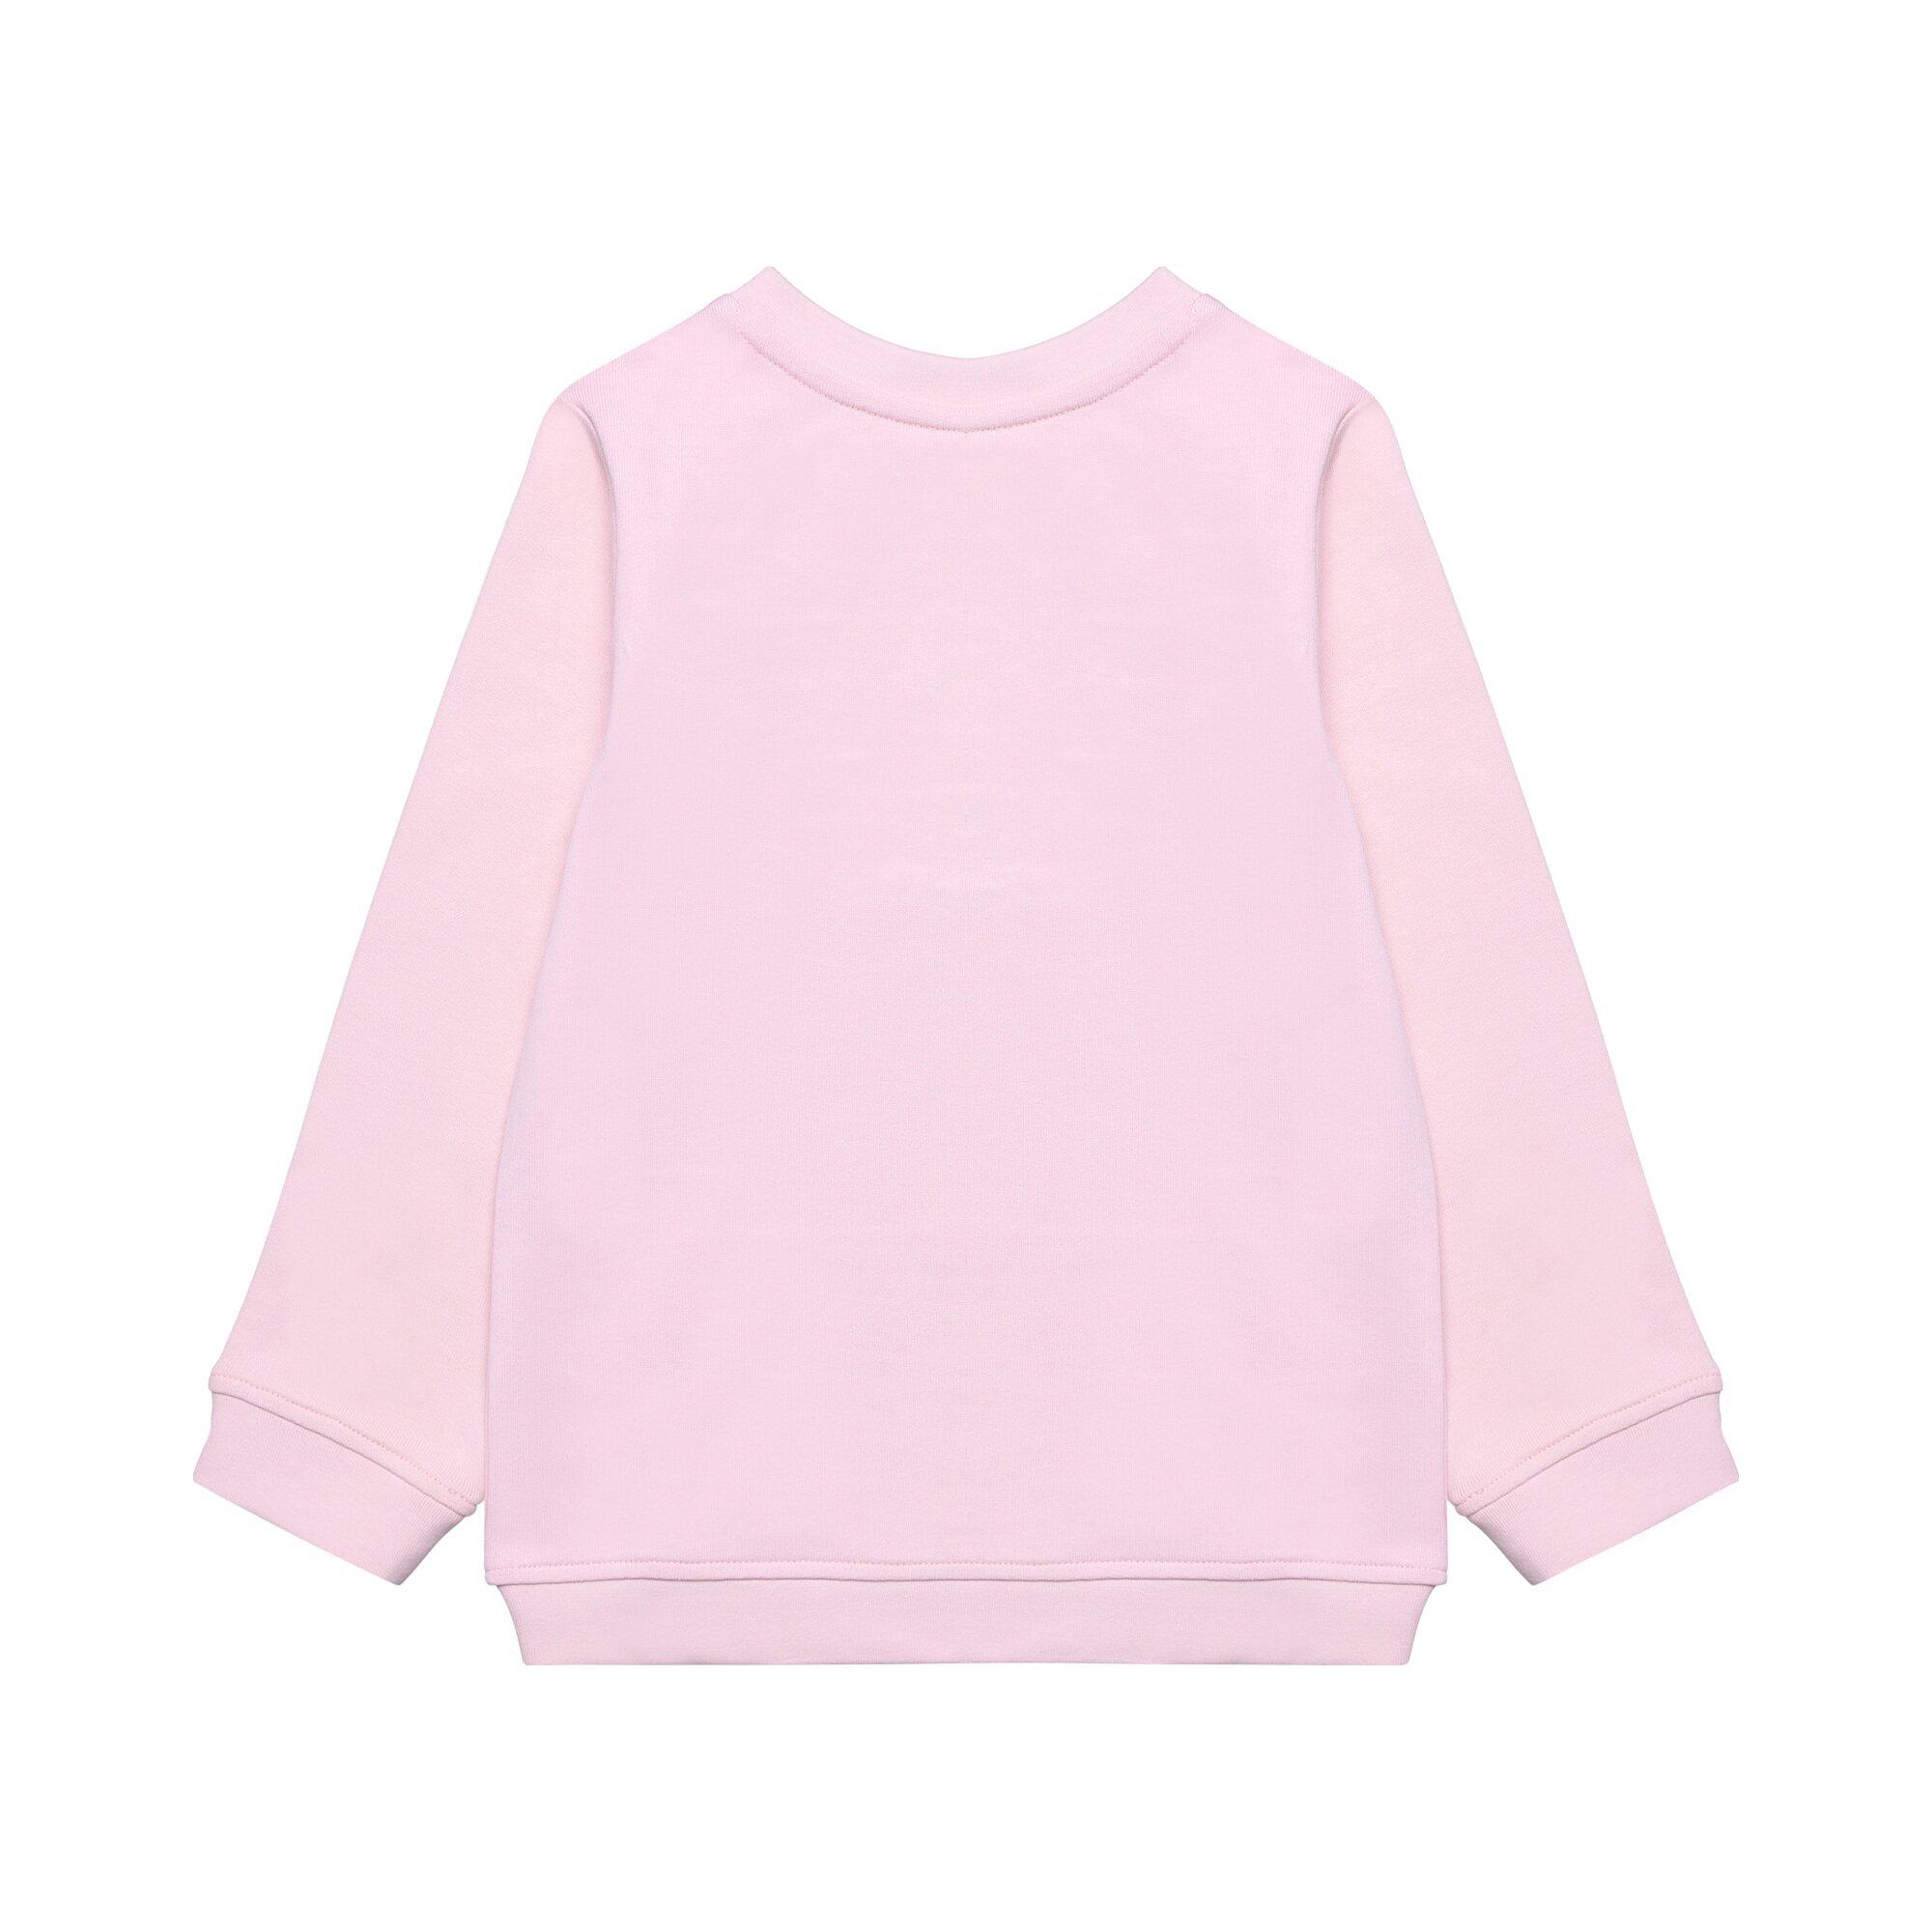 esprit-sweatshirt-herz